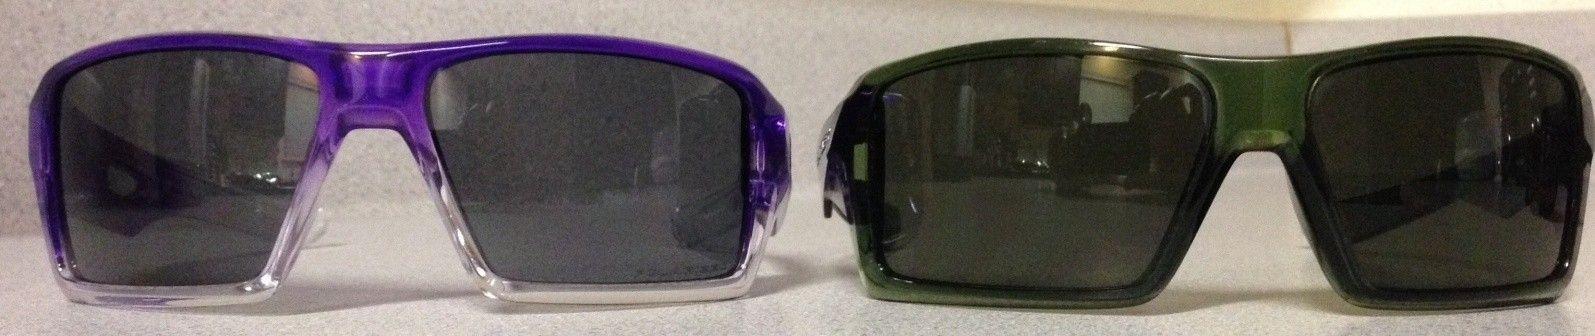 Eyepatch Replacement? - ay7hv5.jpg